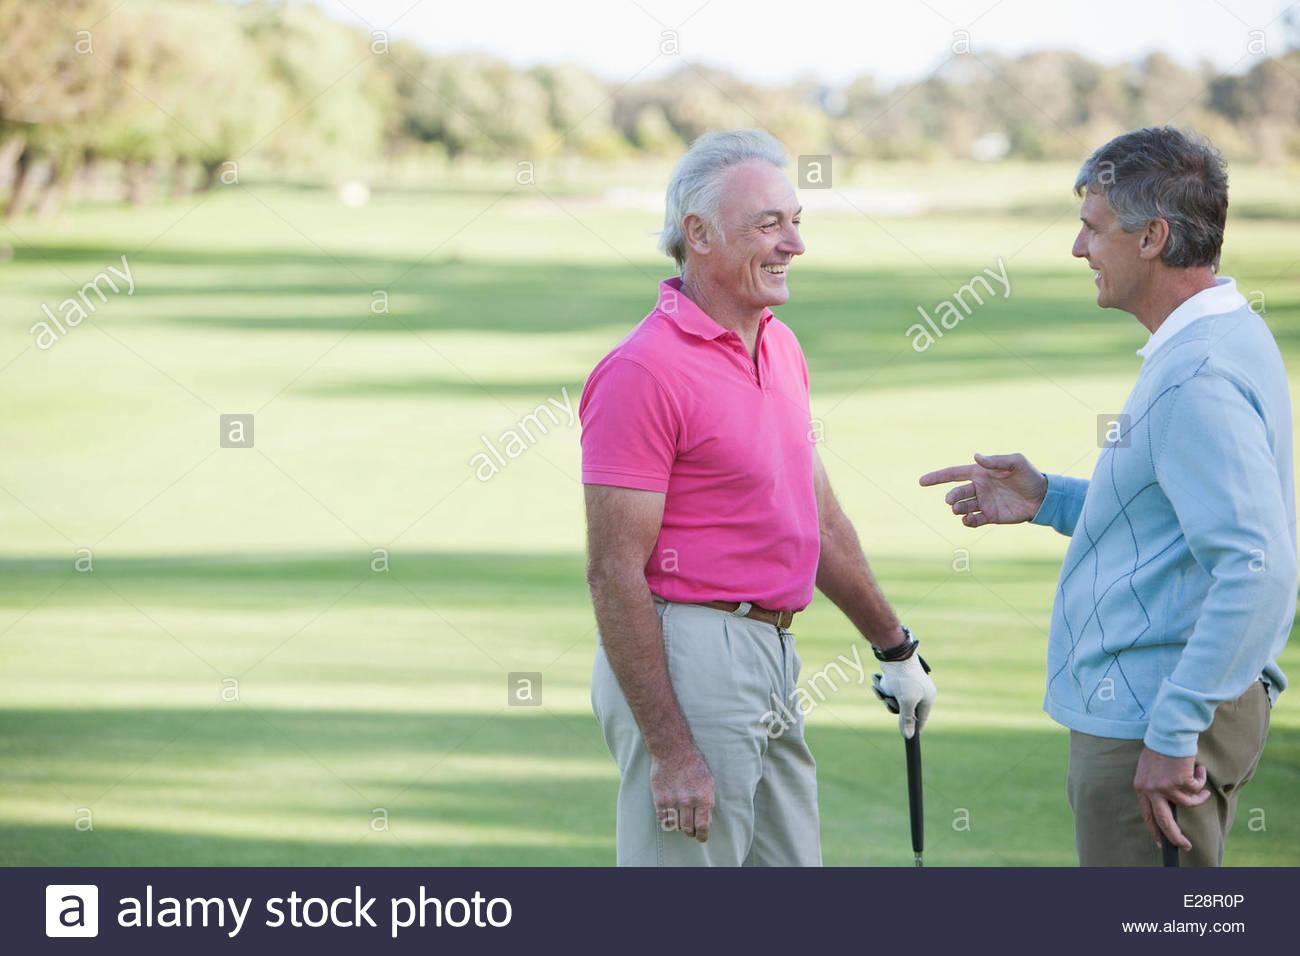 Männer sprechen auf Golfplatz Stockbild